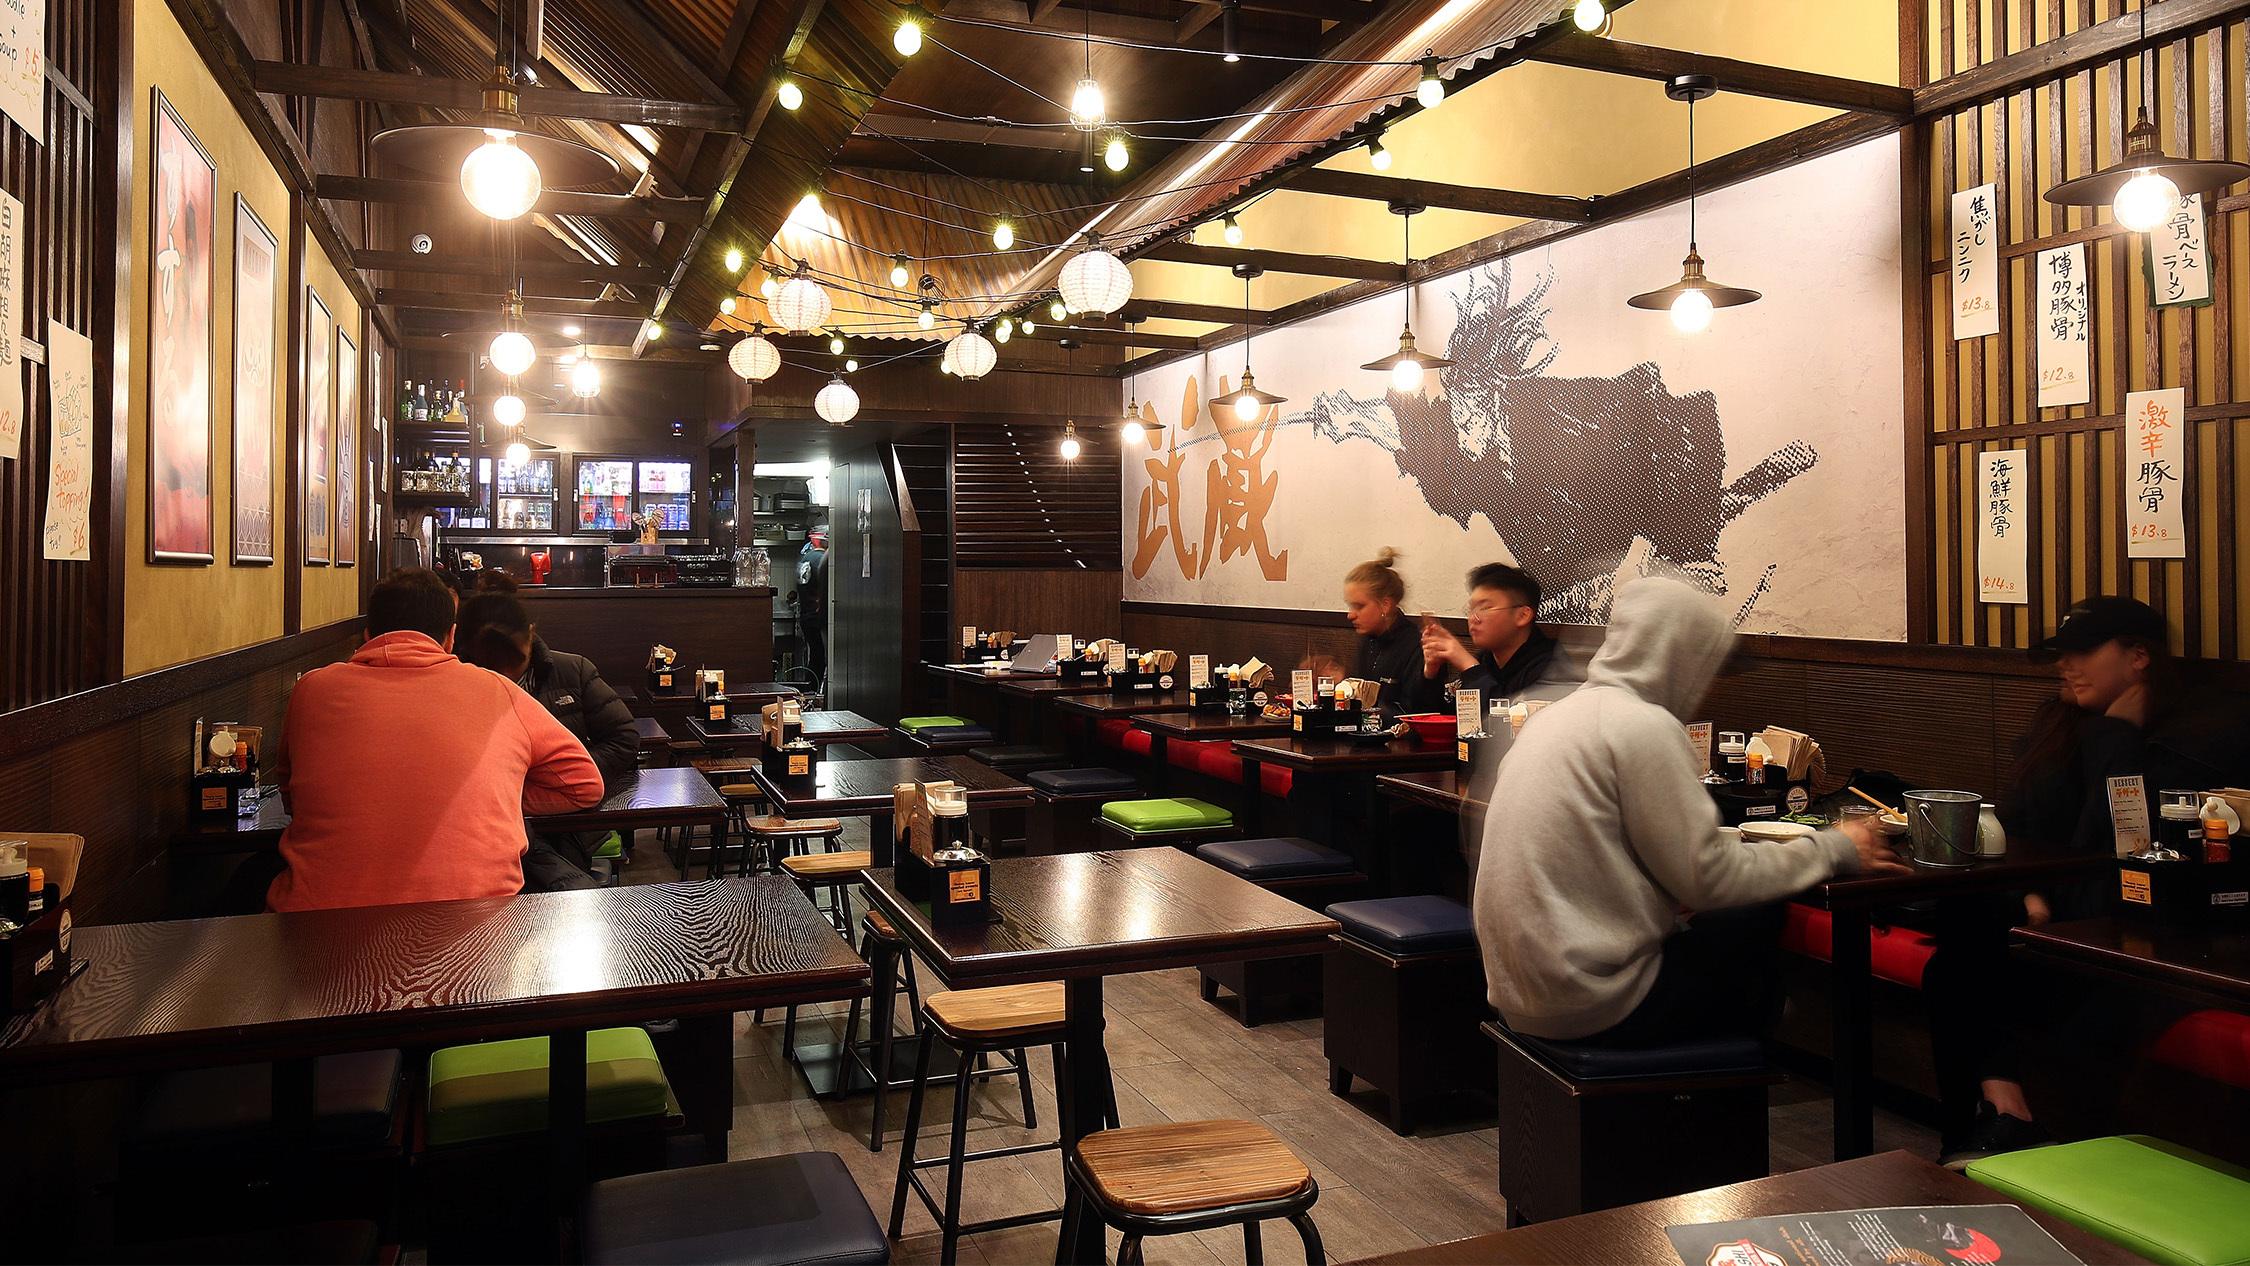 Interior at Musashi Ramen